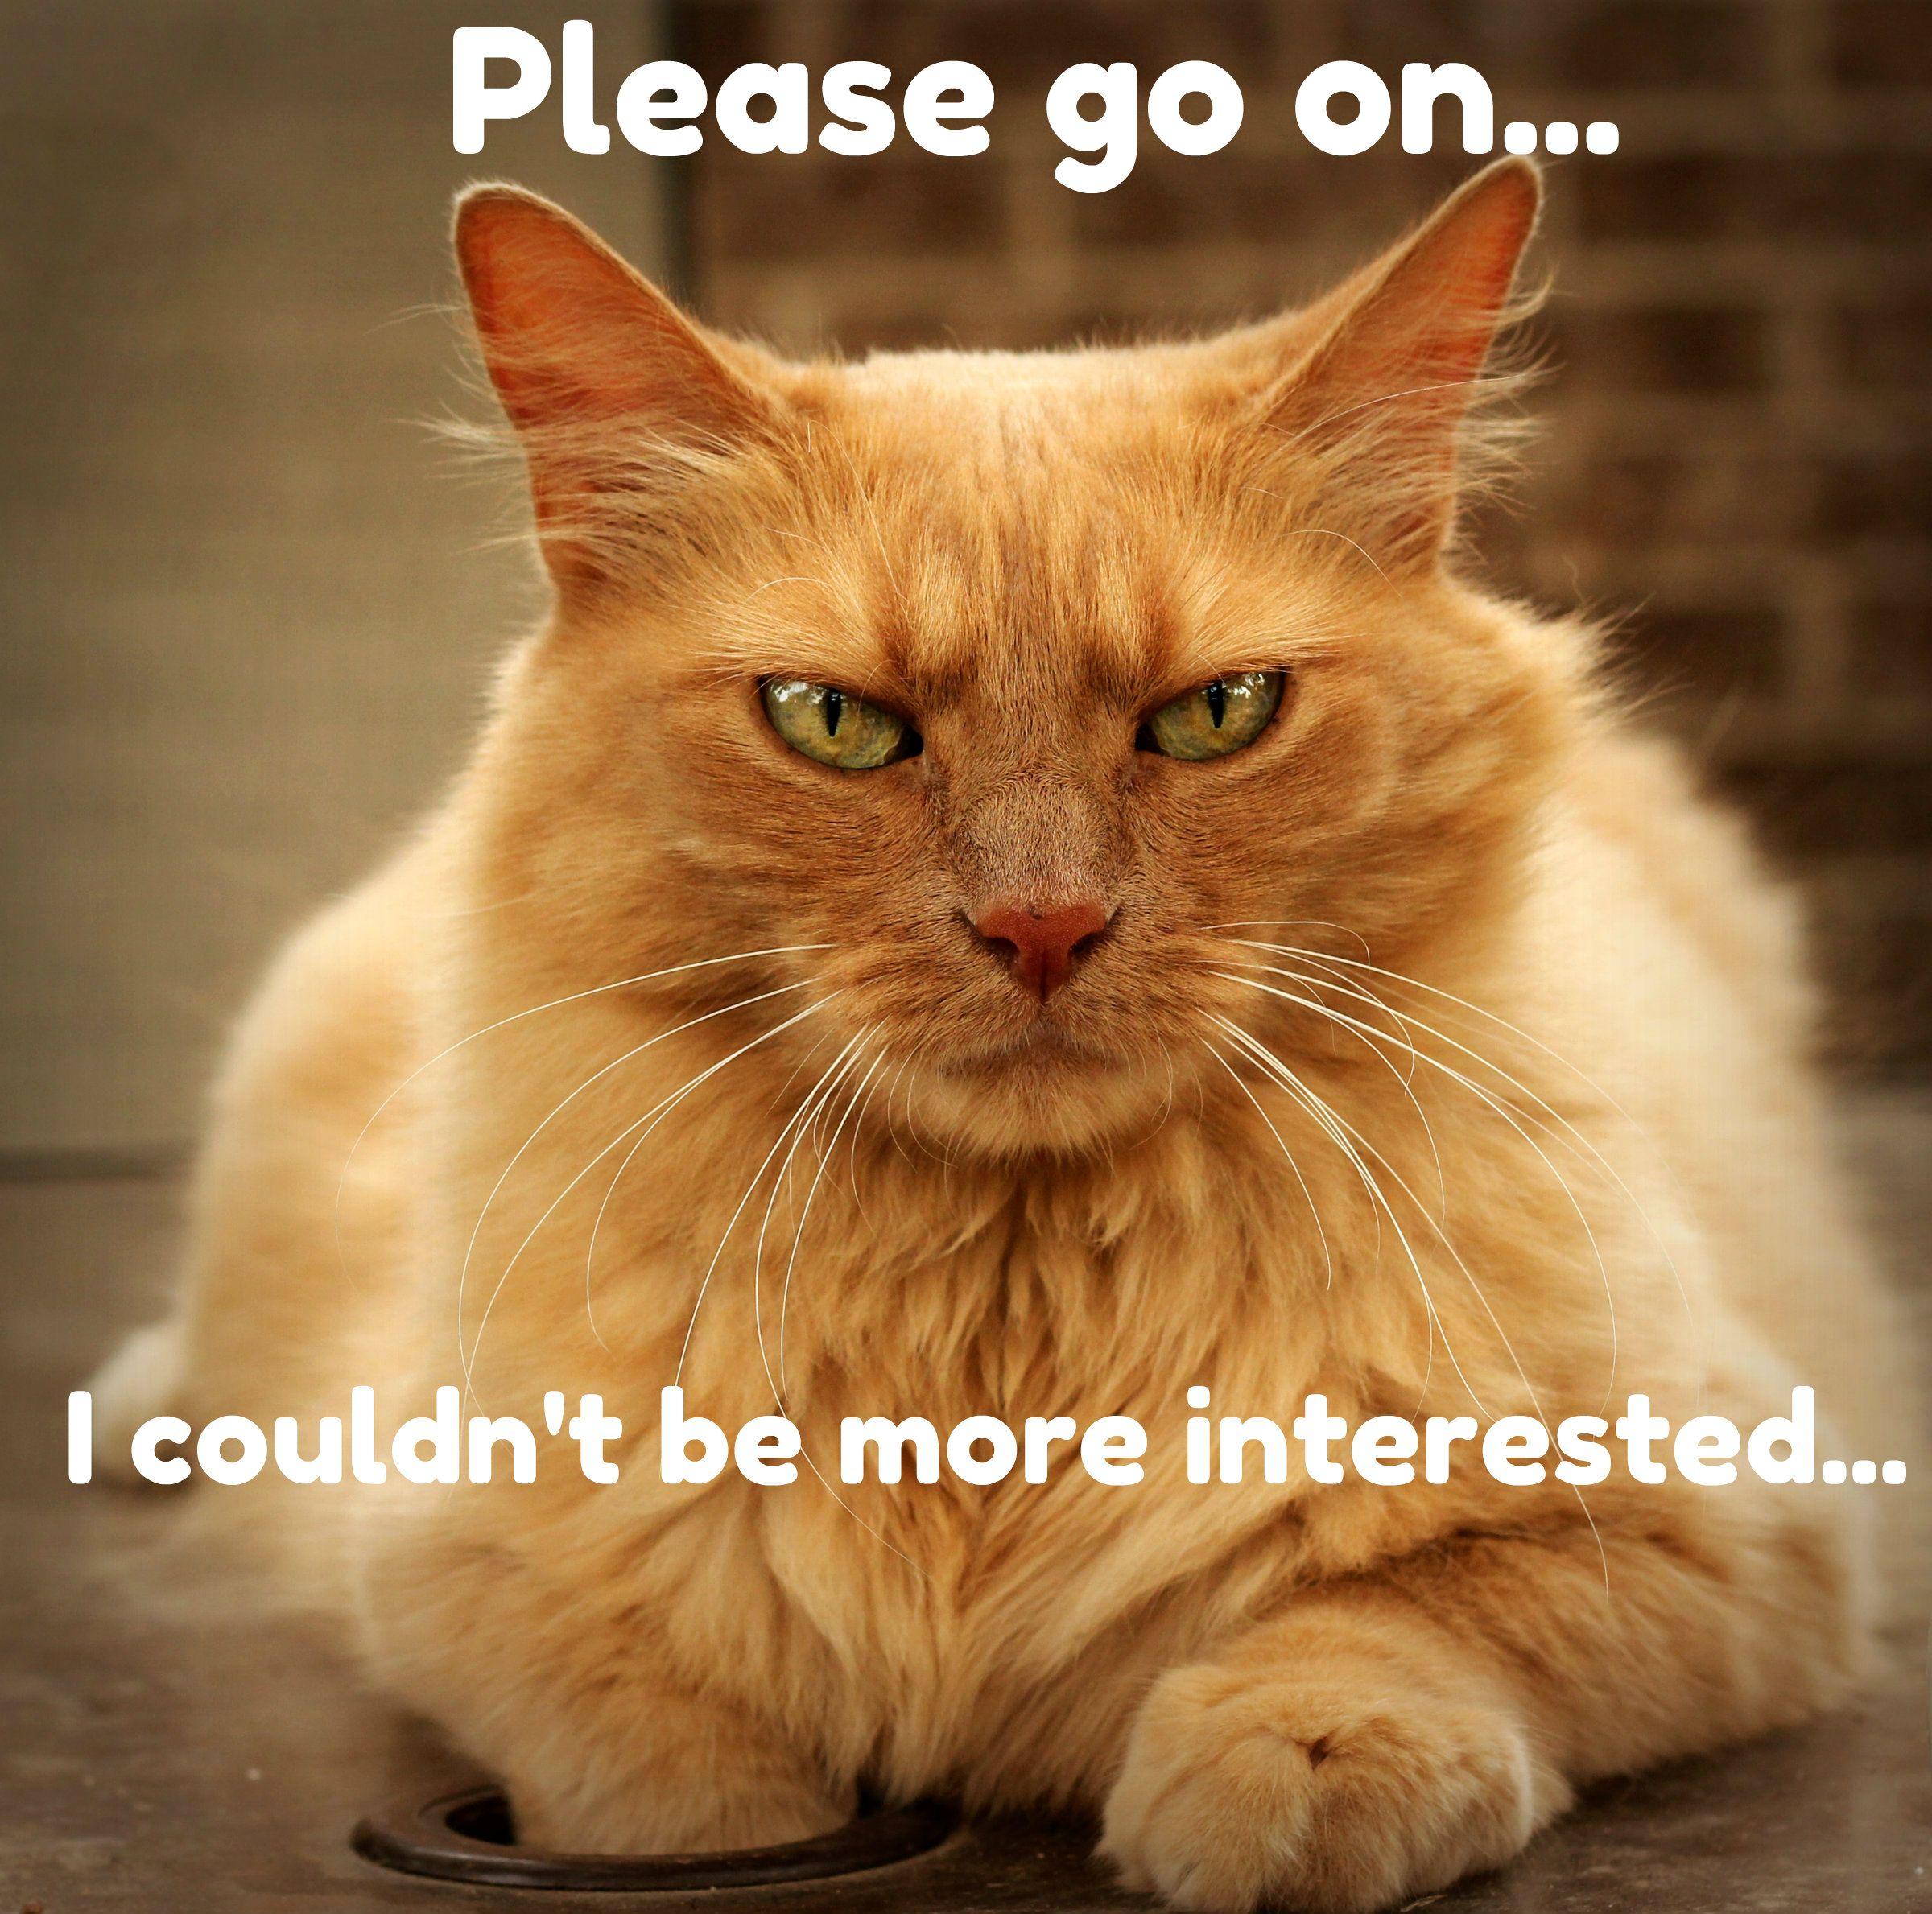 Please go on... Cat memes, Cat pics, Cute animals